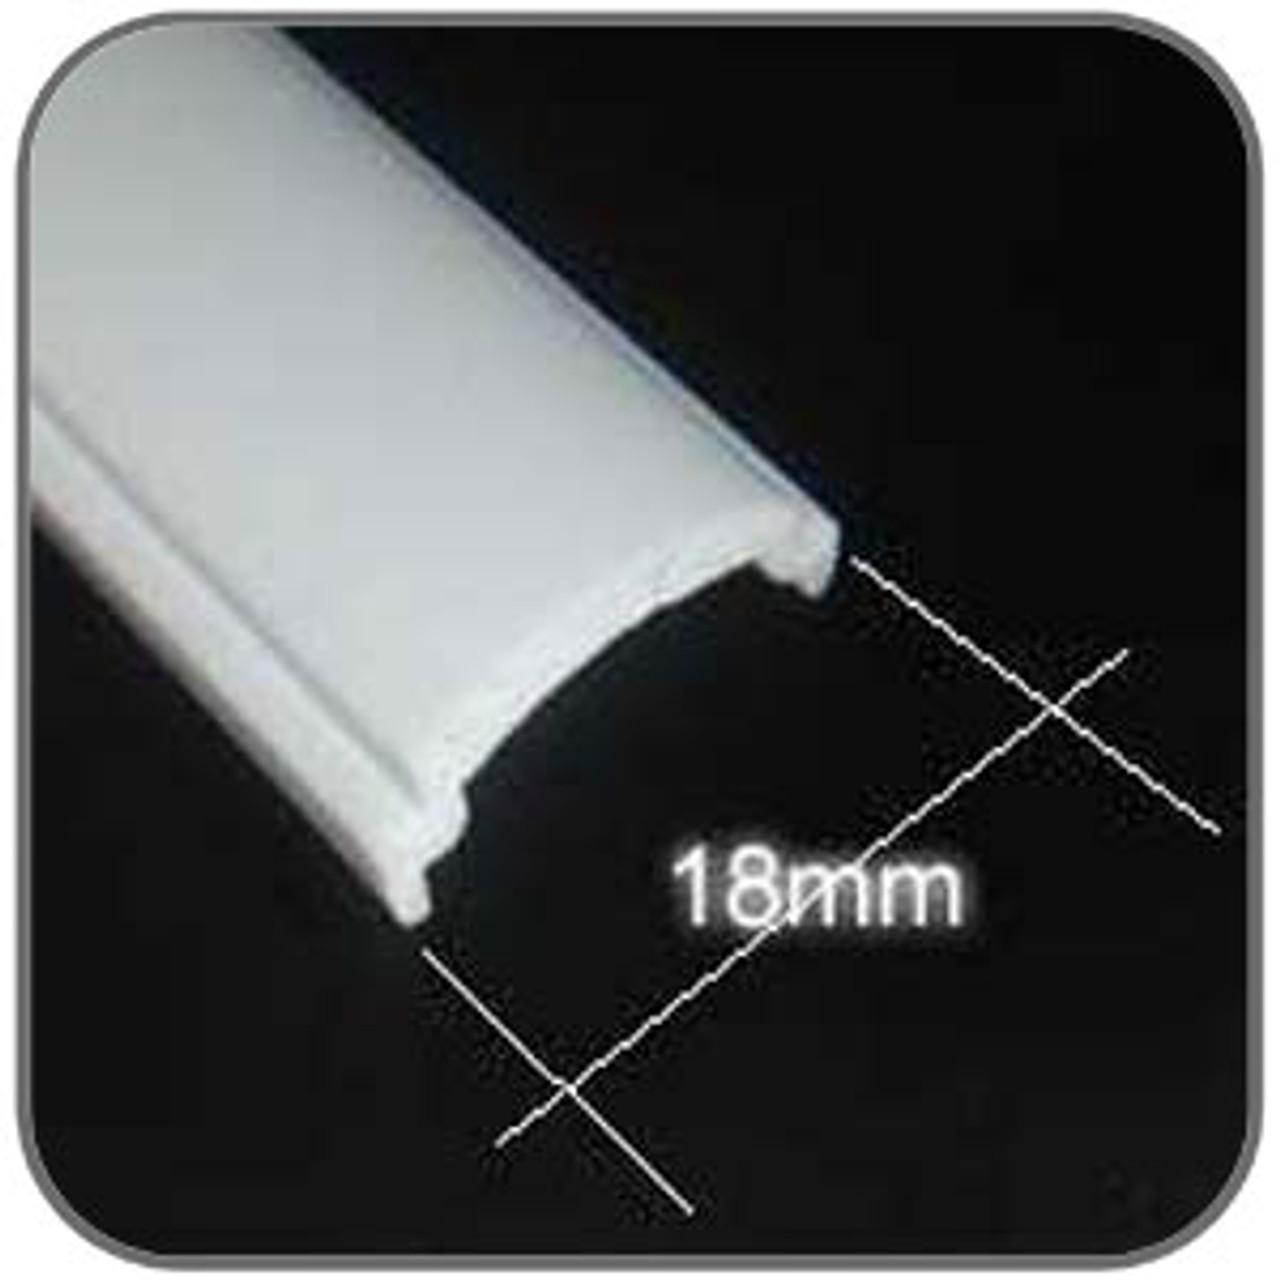 Jayco Mould Insert - 18mm White used mainly on Jayco corner trims